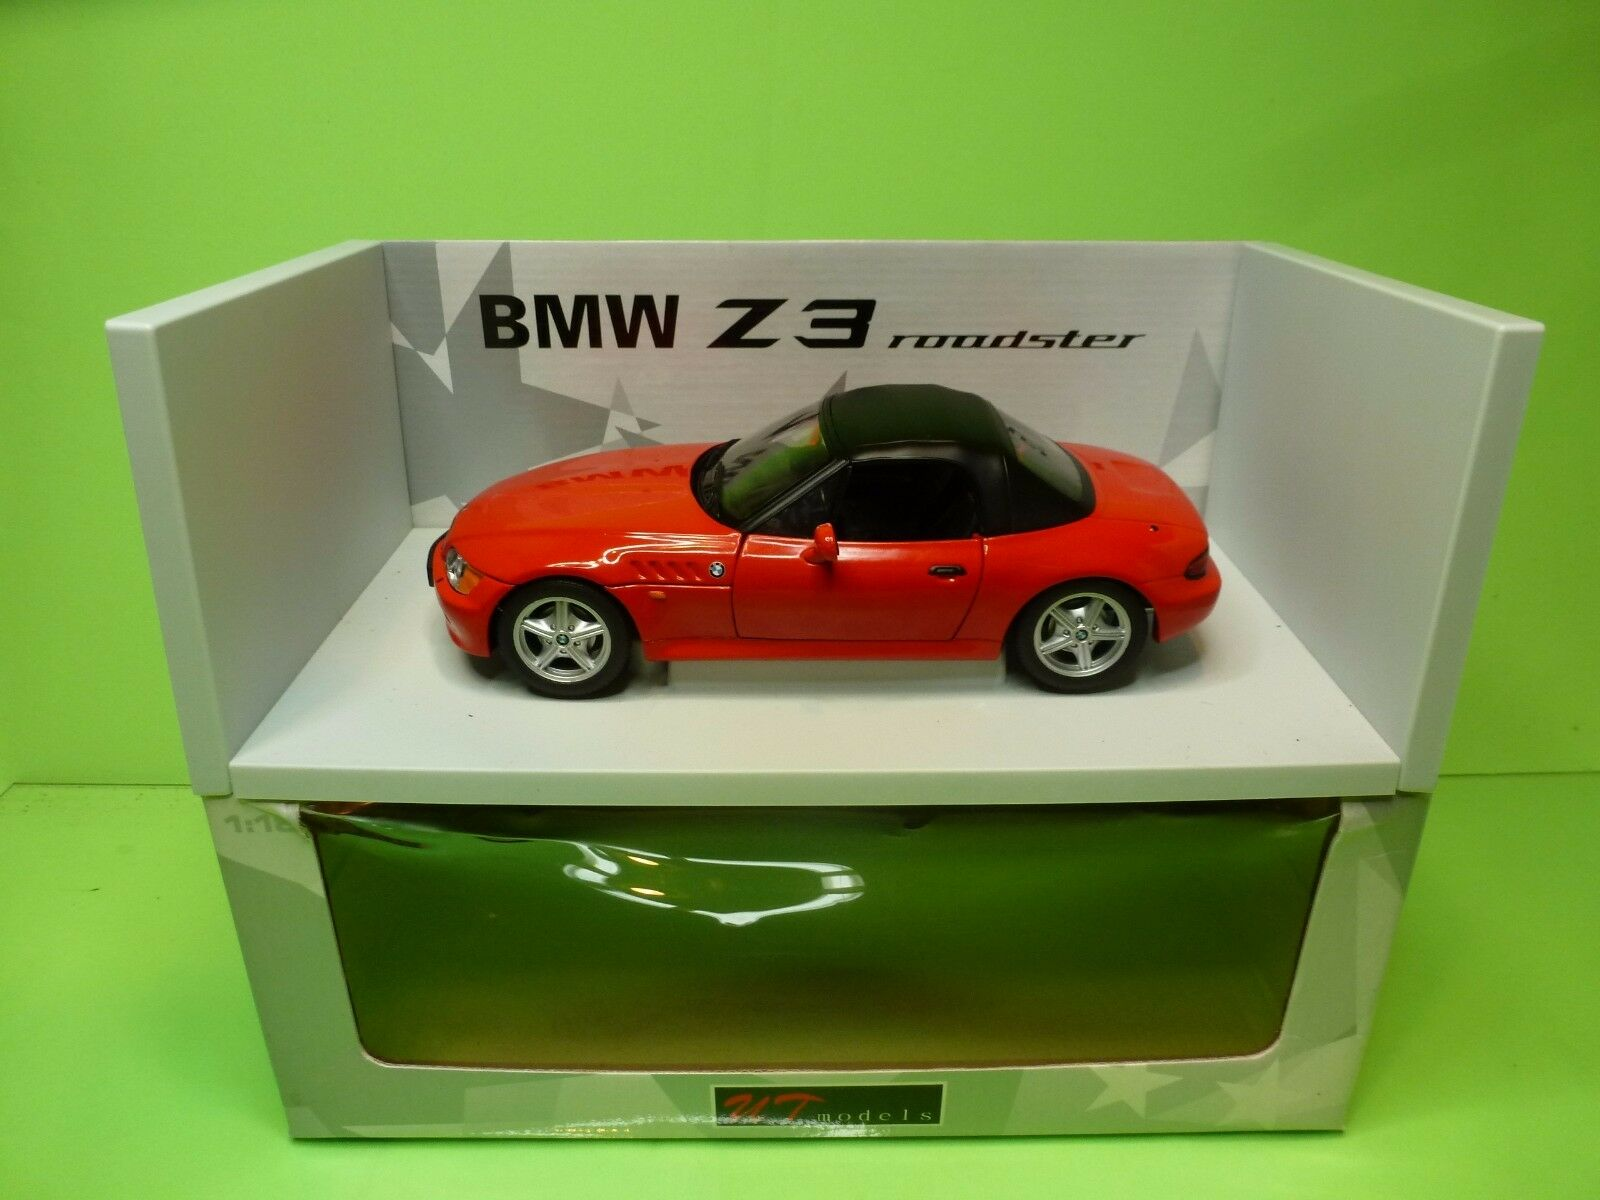 tiendas minoristas UT MODELS 20408 BMW Z3 ROADSTER 1.9 SOFT SOFT SOFT - CLOSED TOP - 1 18 - EXCELLENT IN BOX  descuento de ventas